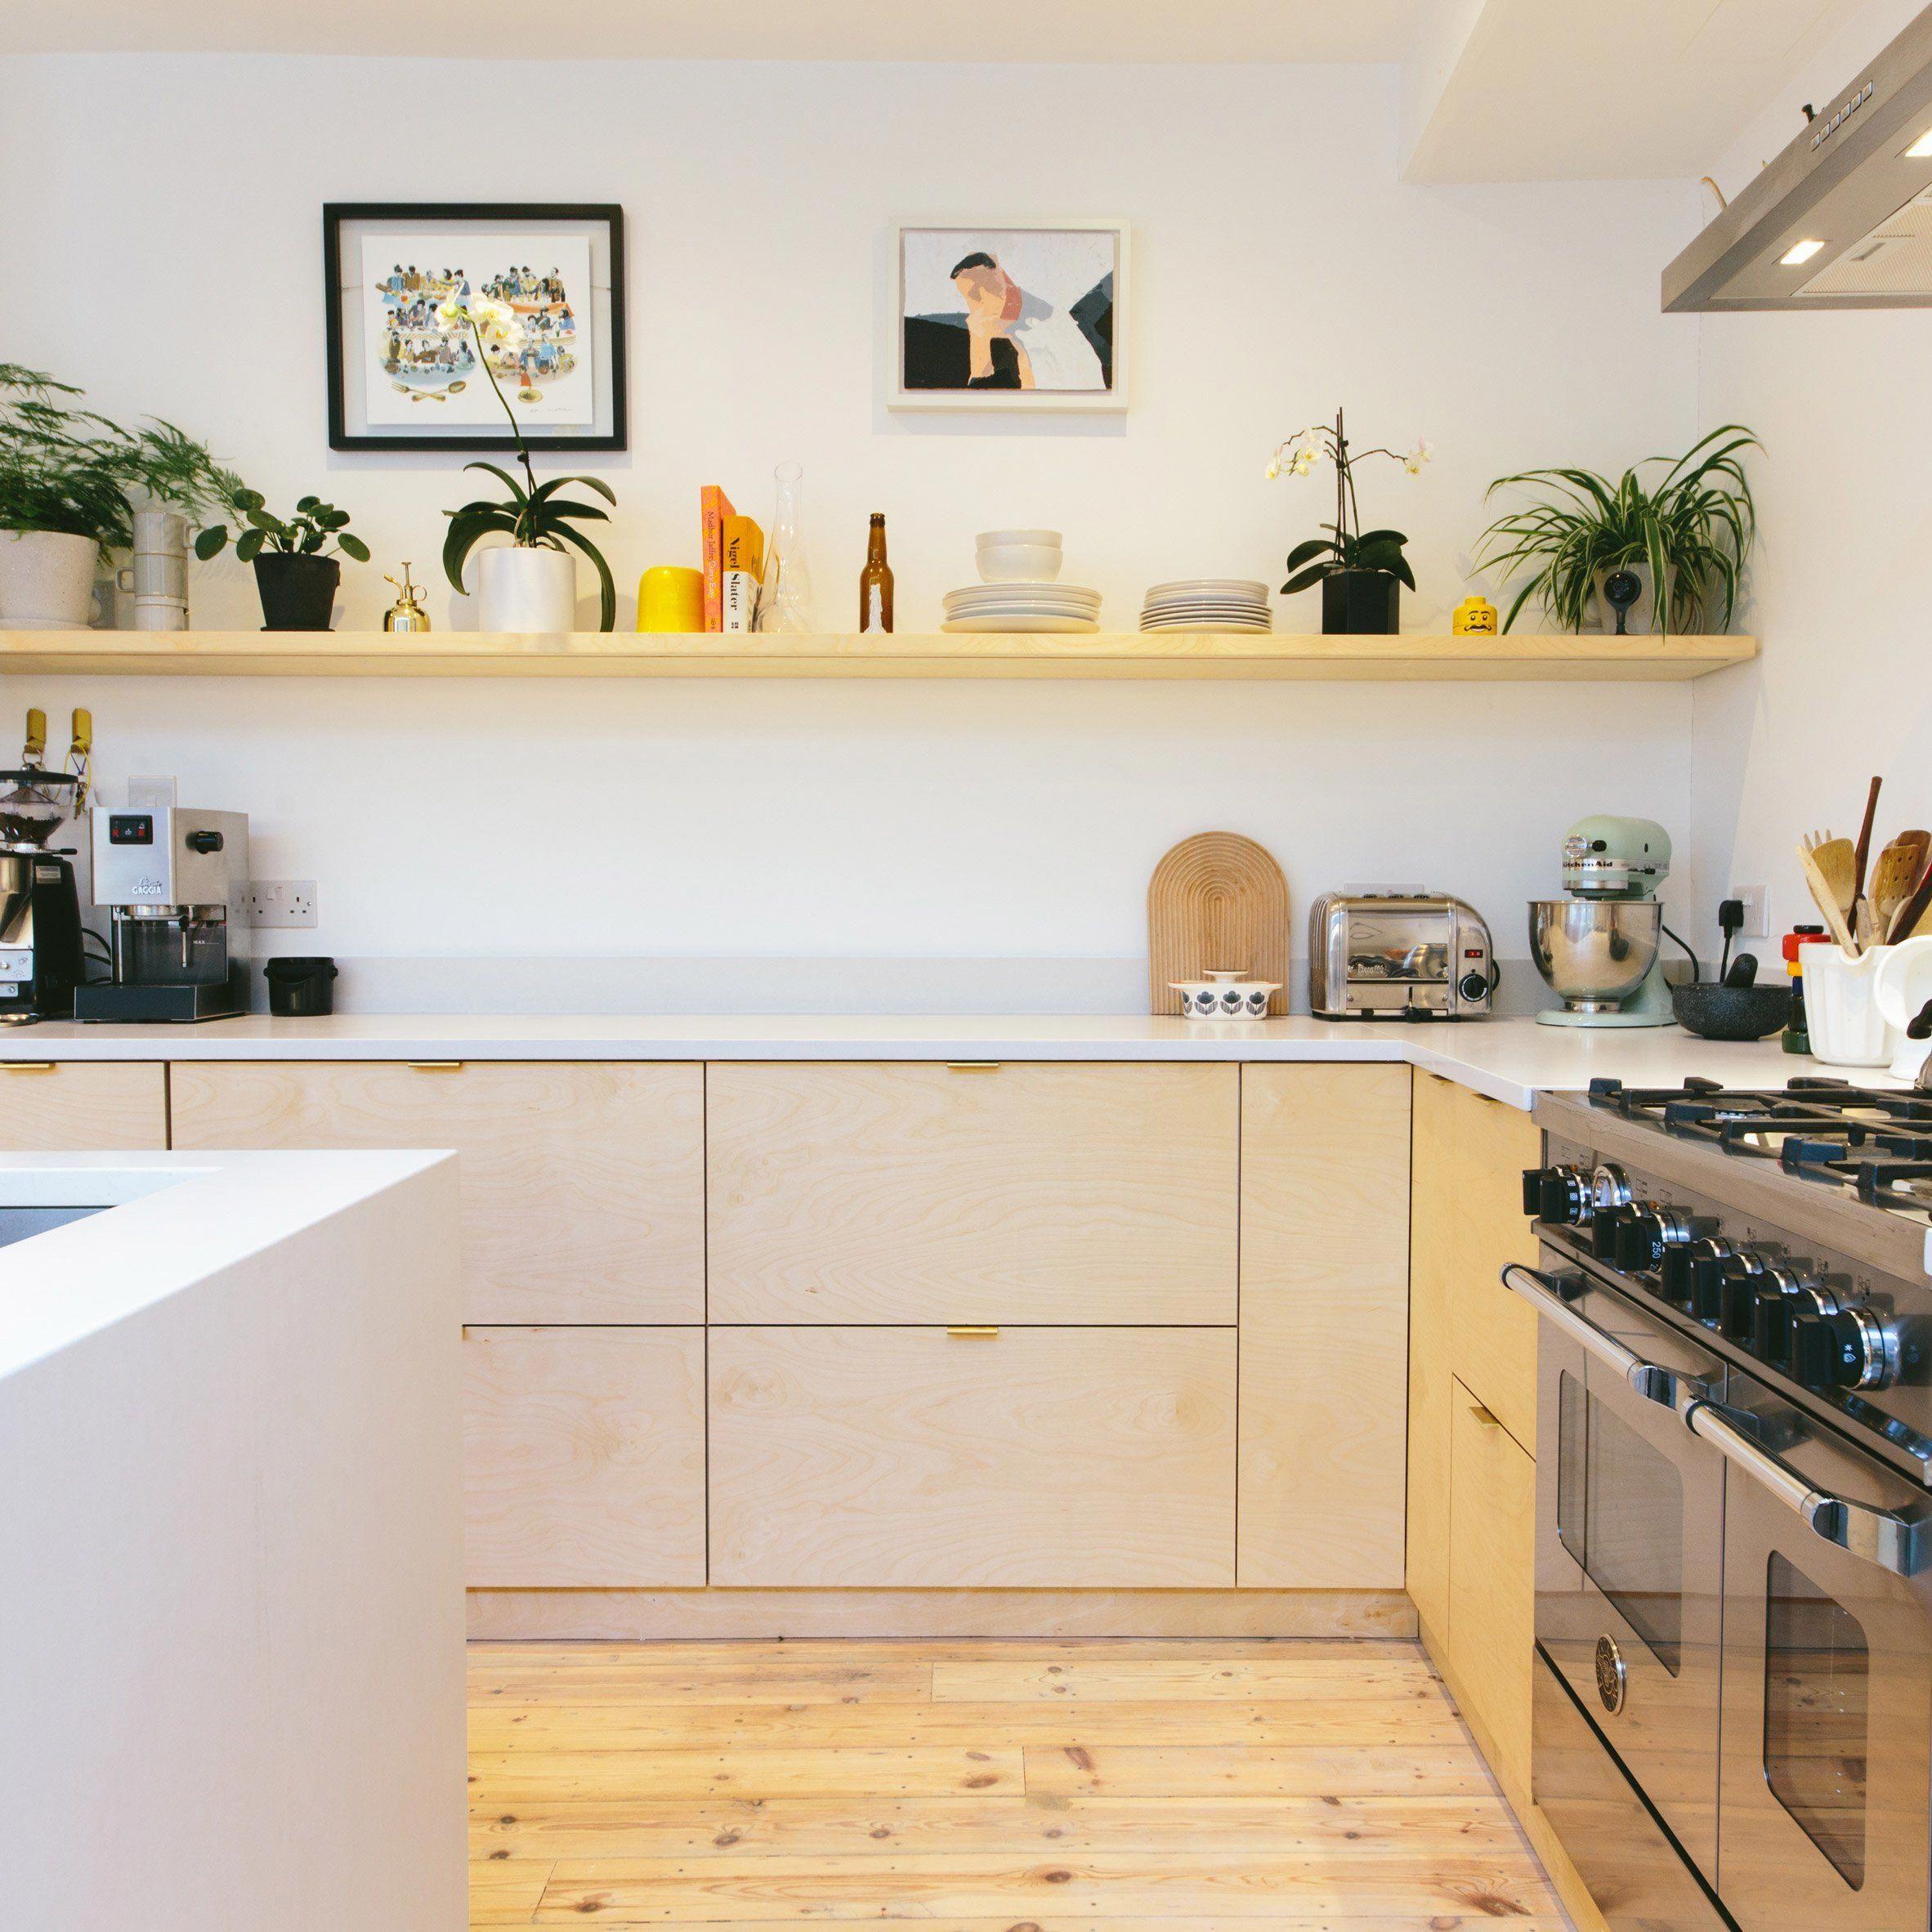 Grenen Houten Vloer In De Keuken Www Fairwood Nl Modernhomedecorkitchen Plywood Kitchen Ikea Metod Kitchen Ikea Kitchen Cabinets